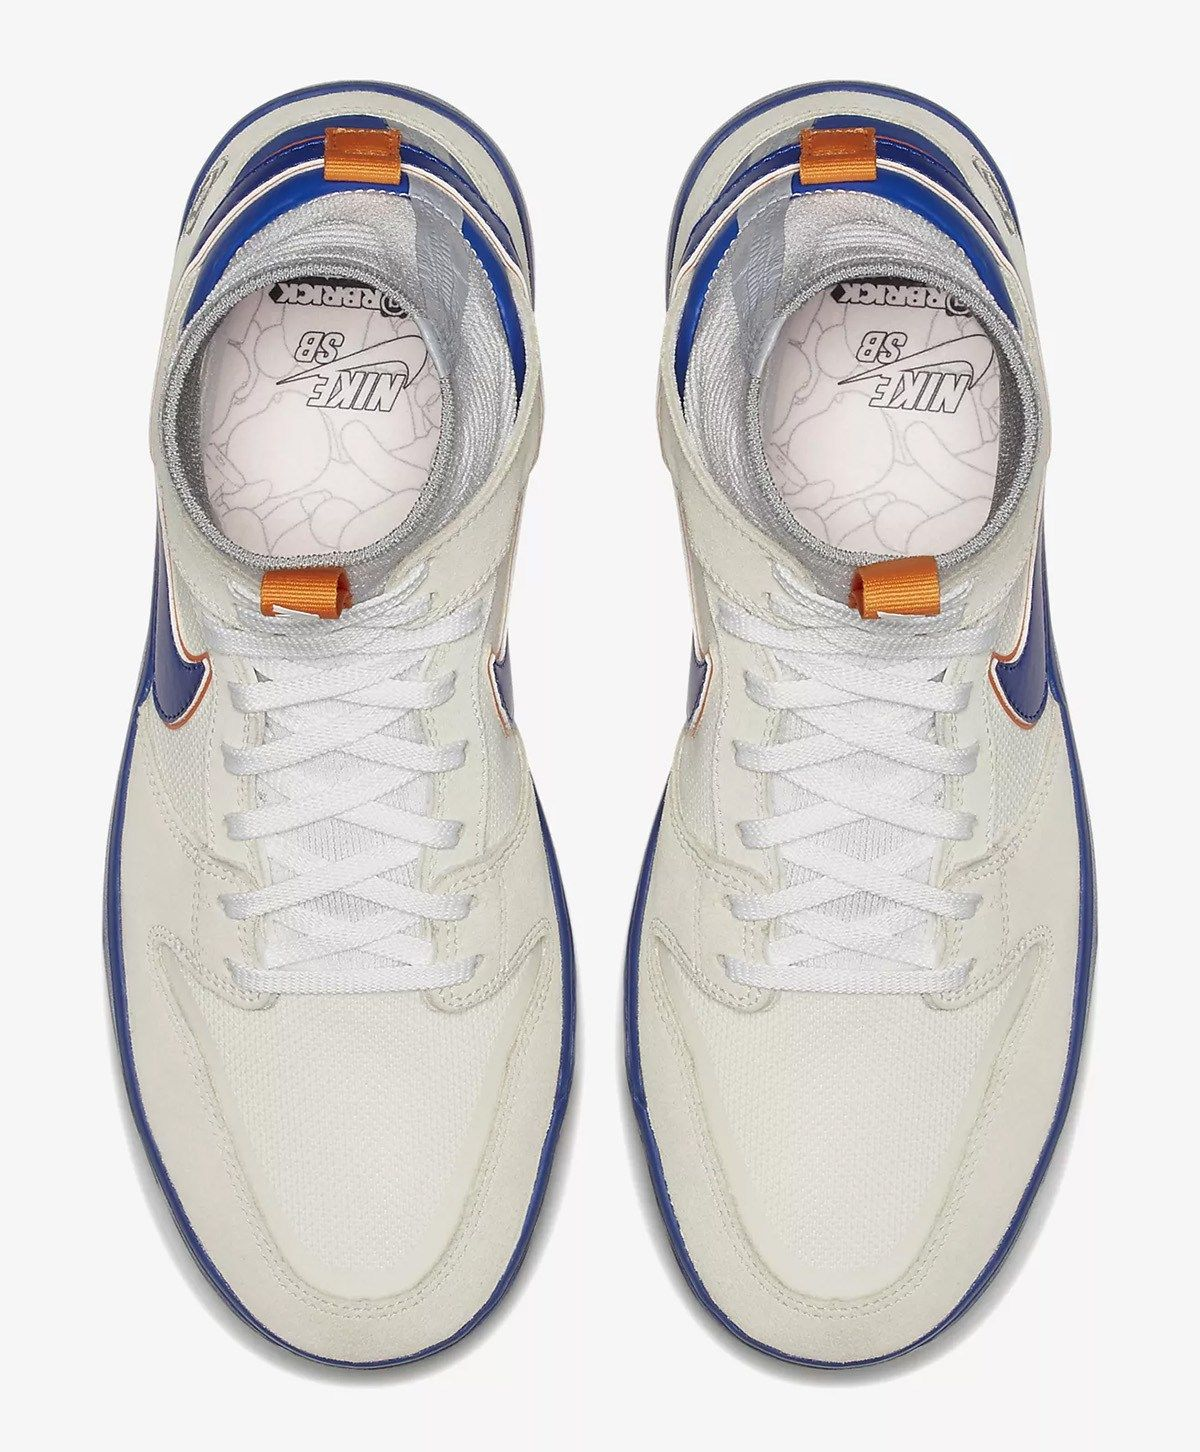 efe20a72cec9 MEDICOM TOY x Nike SB Zoom Dunk High Elite - EU Kicks  Sneaker Magazine